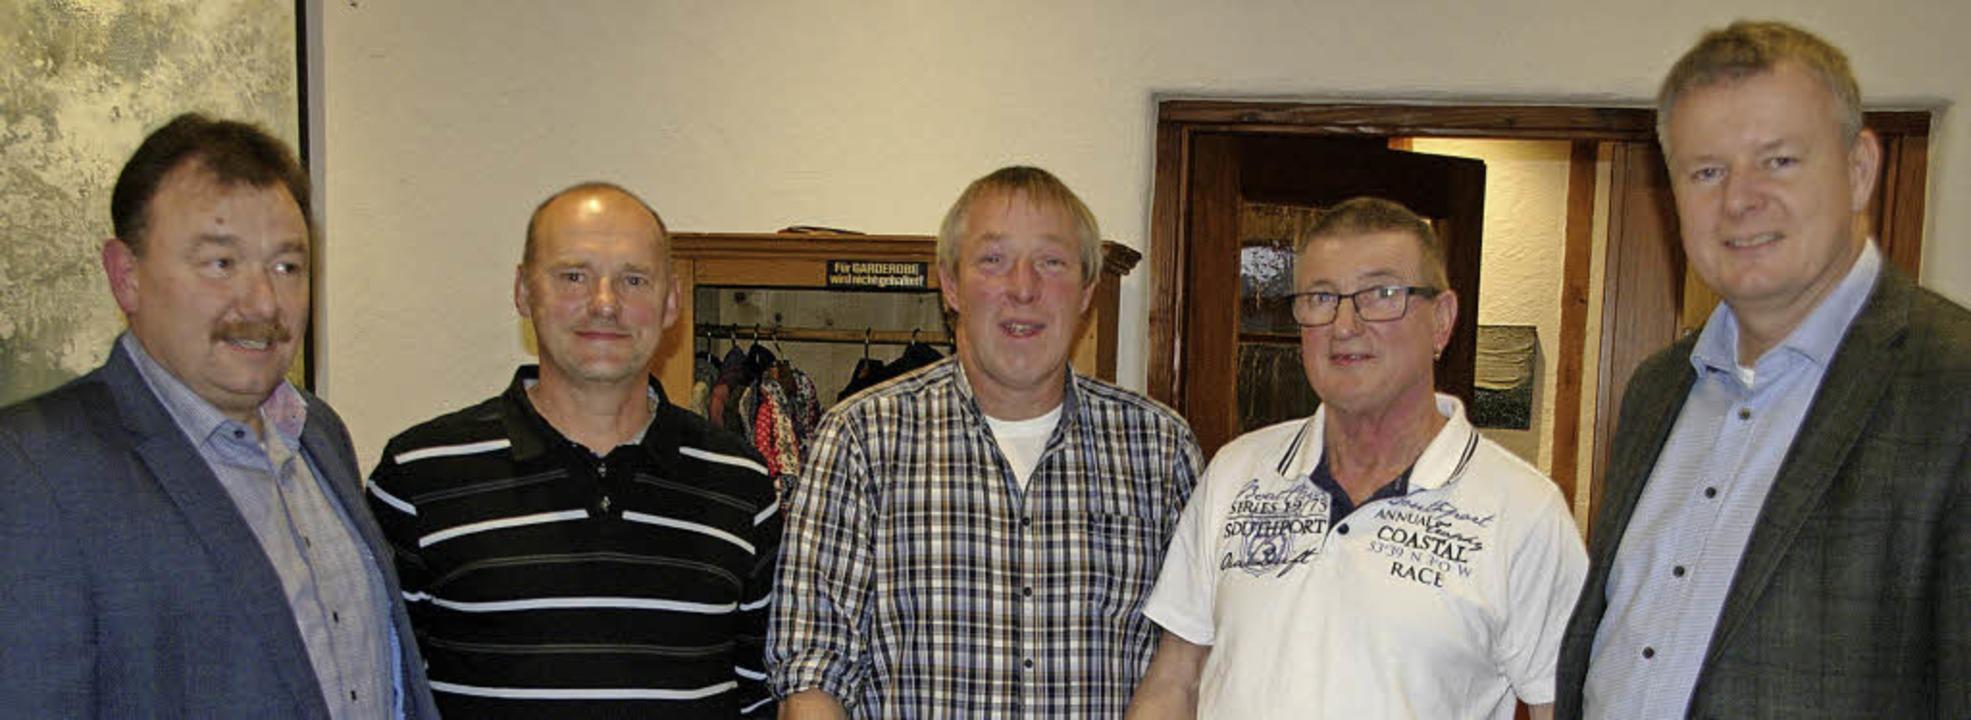 Martin Benz, Petr Hivincev, Matthias S...d Bürgermeister Dirk Blens (von links)  | Foto: map